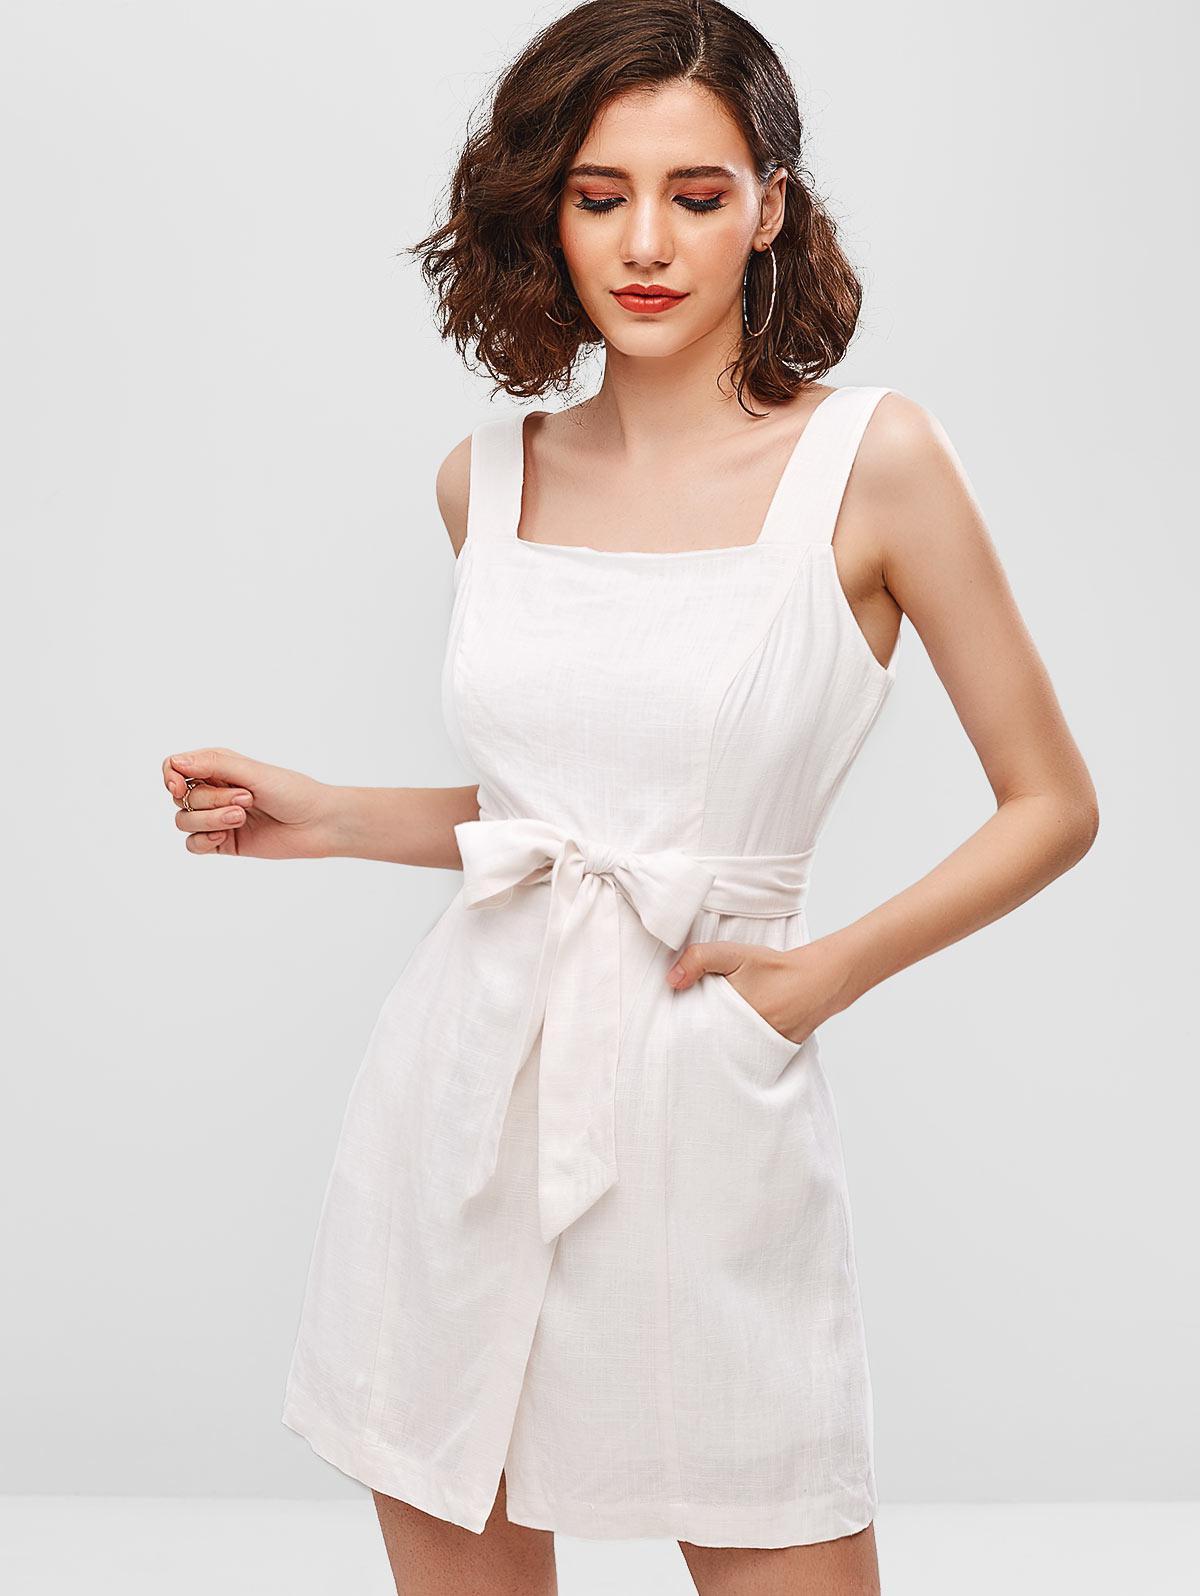 ZAFUL Sleeveless Plain Belted Overlap Dress thumbnail